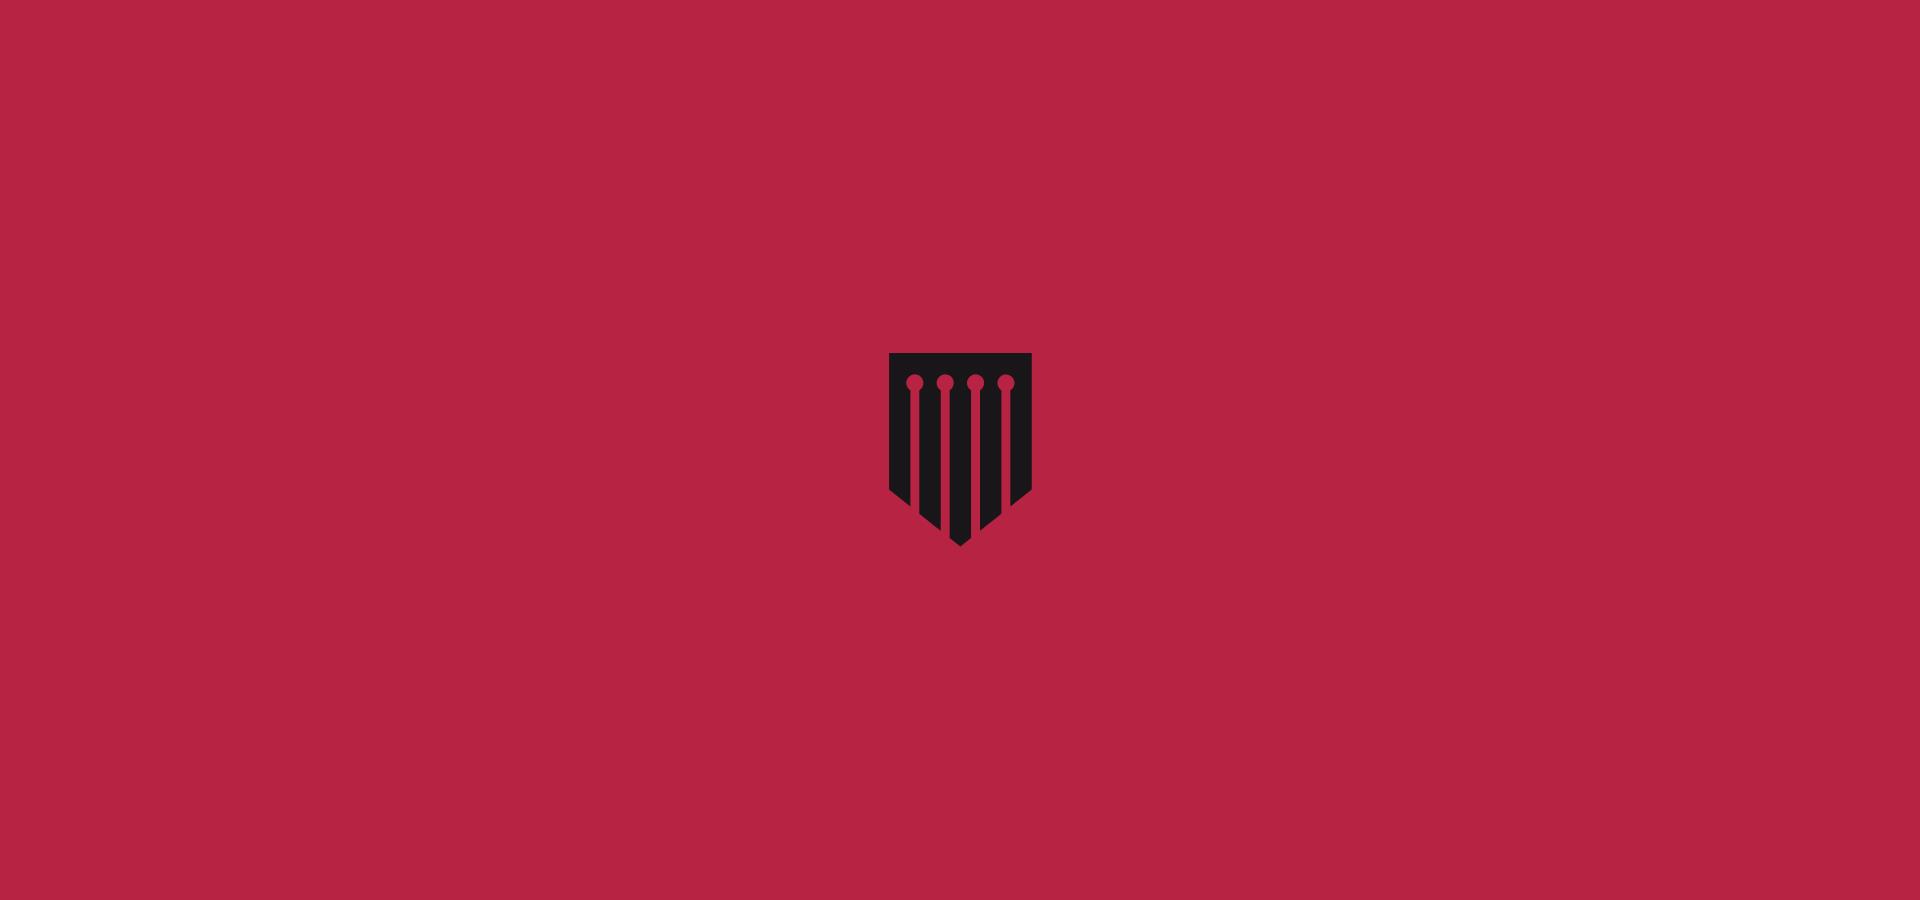 Dominik-Pacholczyk-Logo-Design-Collection-02